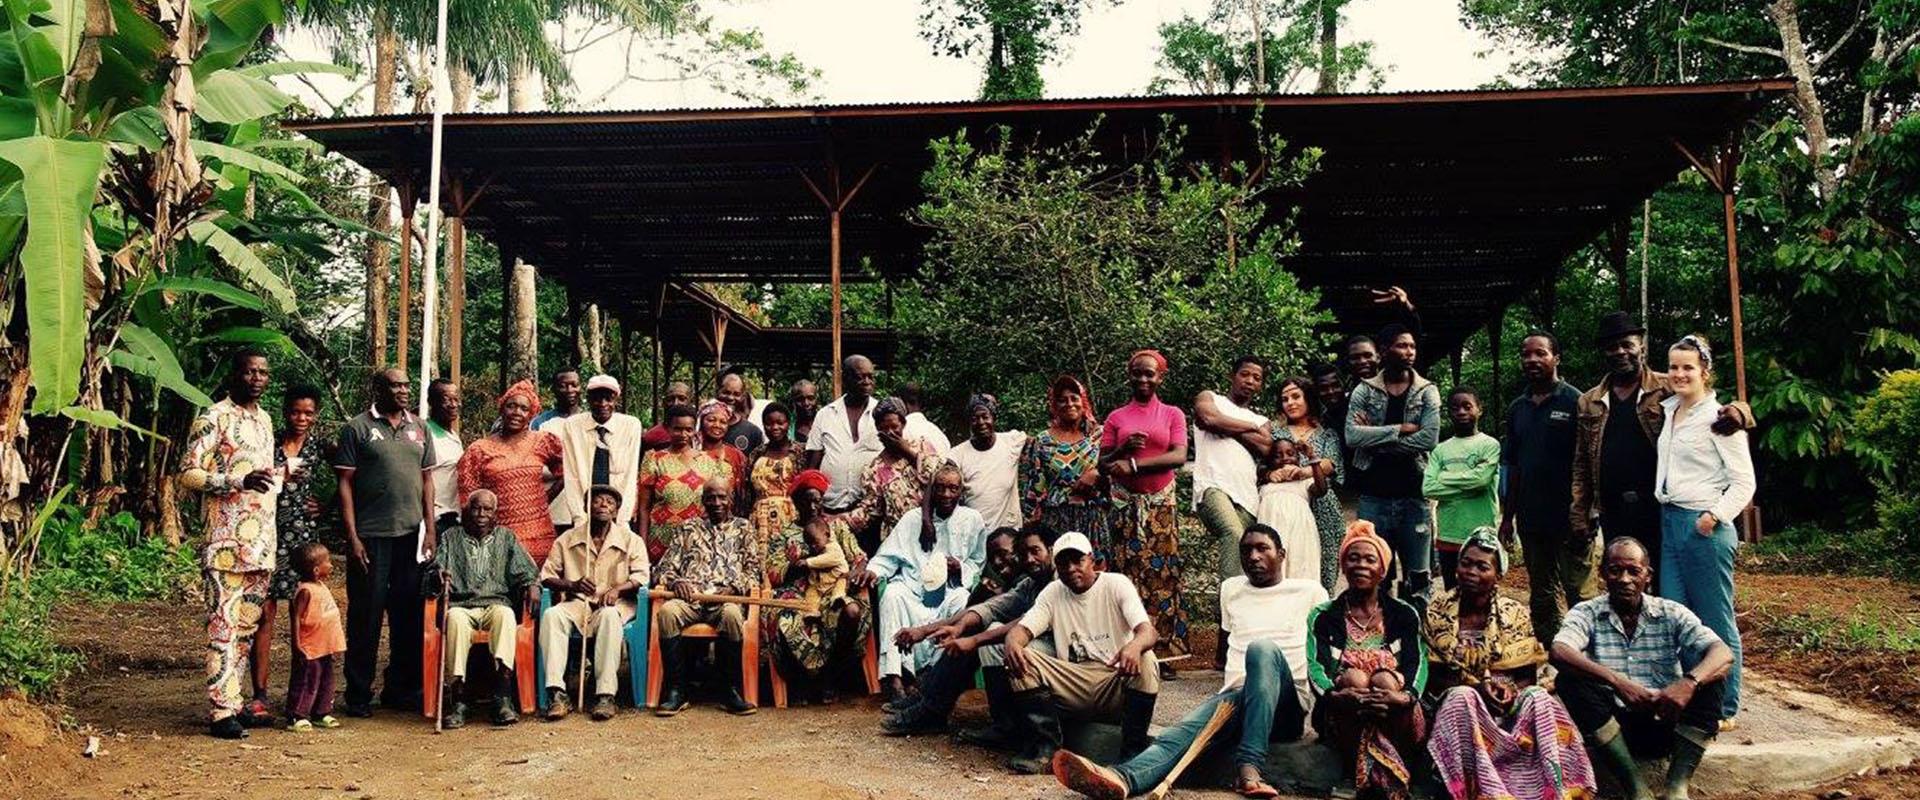 Projet Vie.llage_1_barla_architectes_Ovangoul_nkol-assi_cameroun